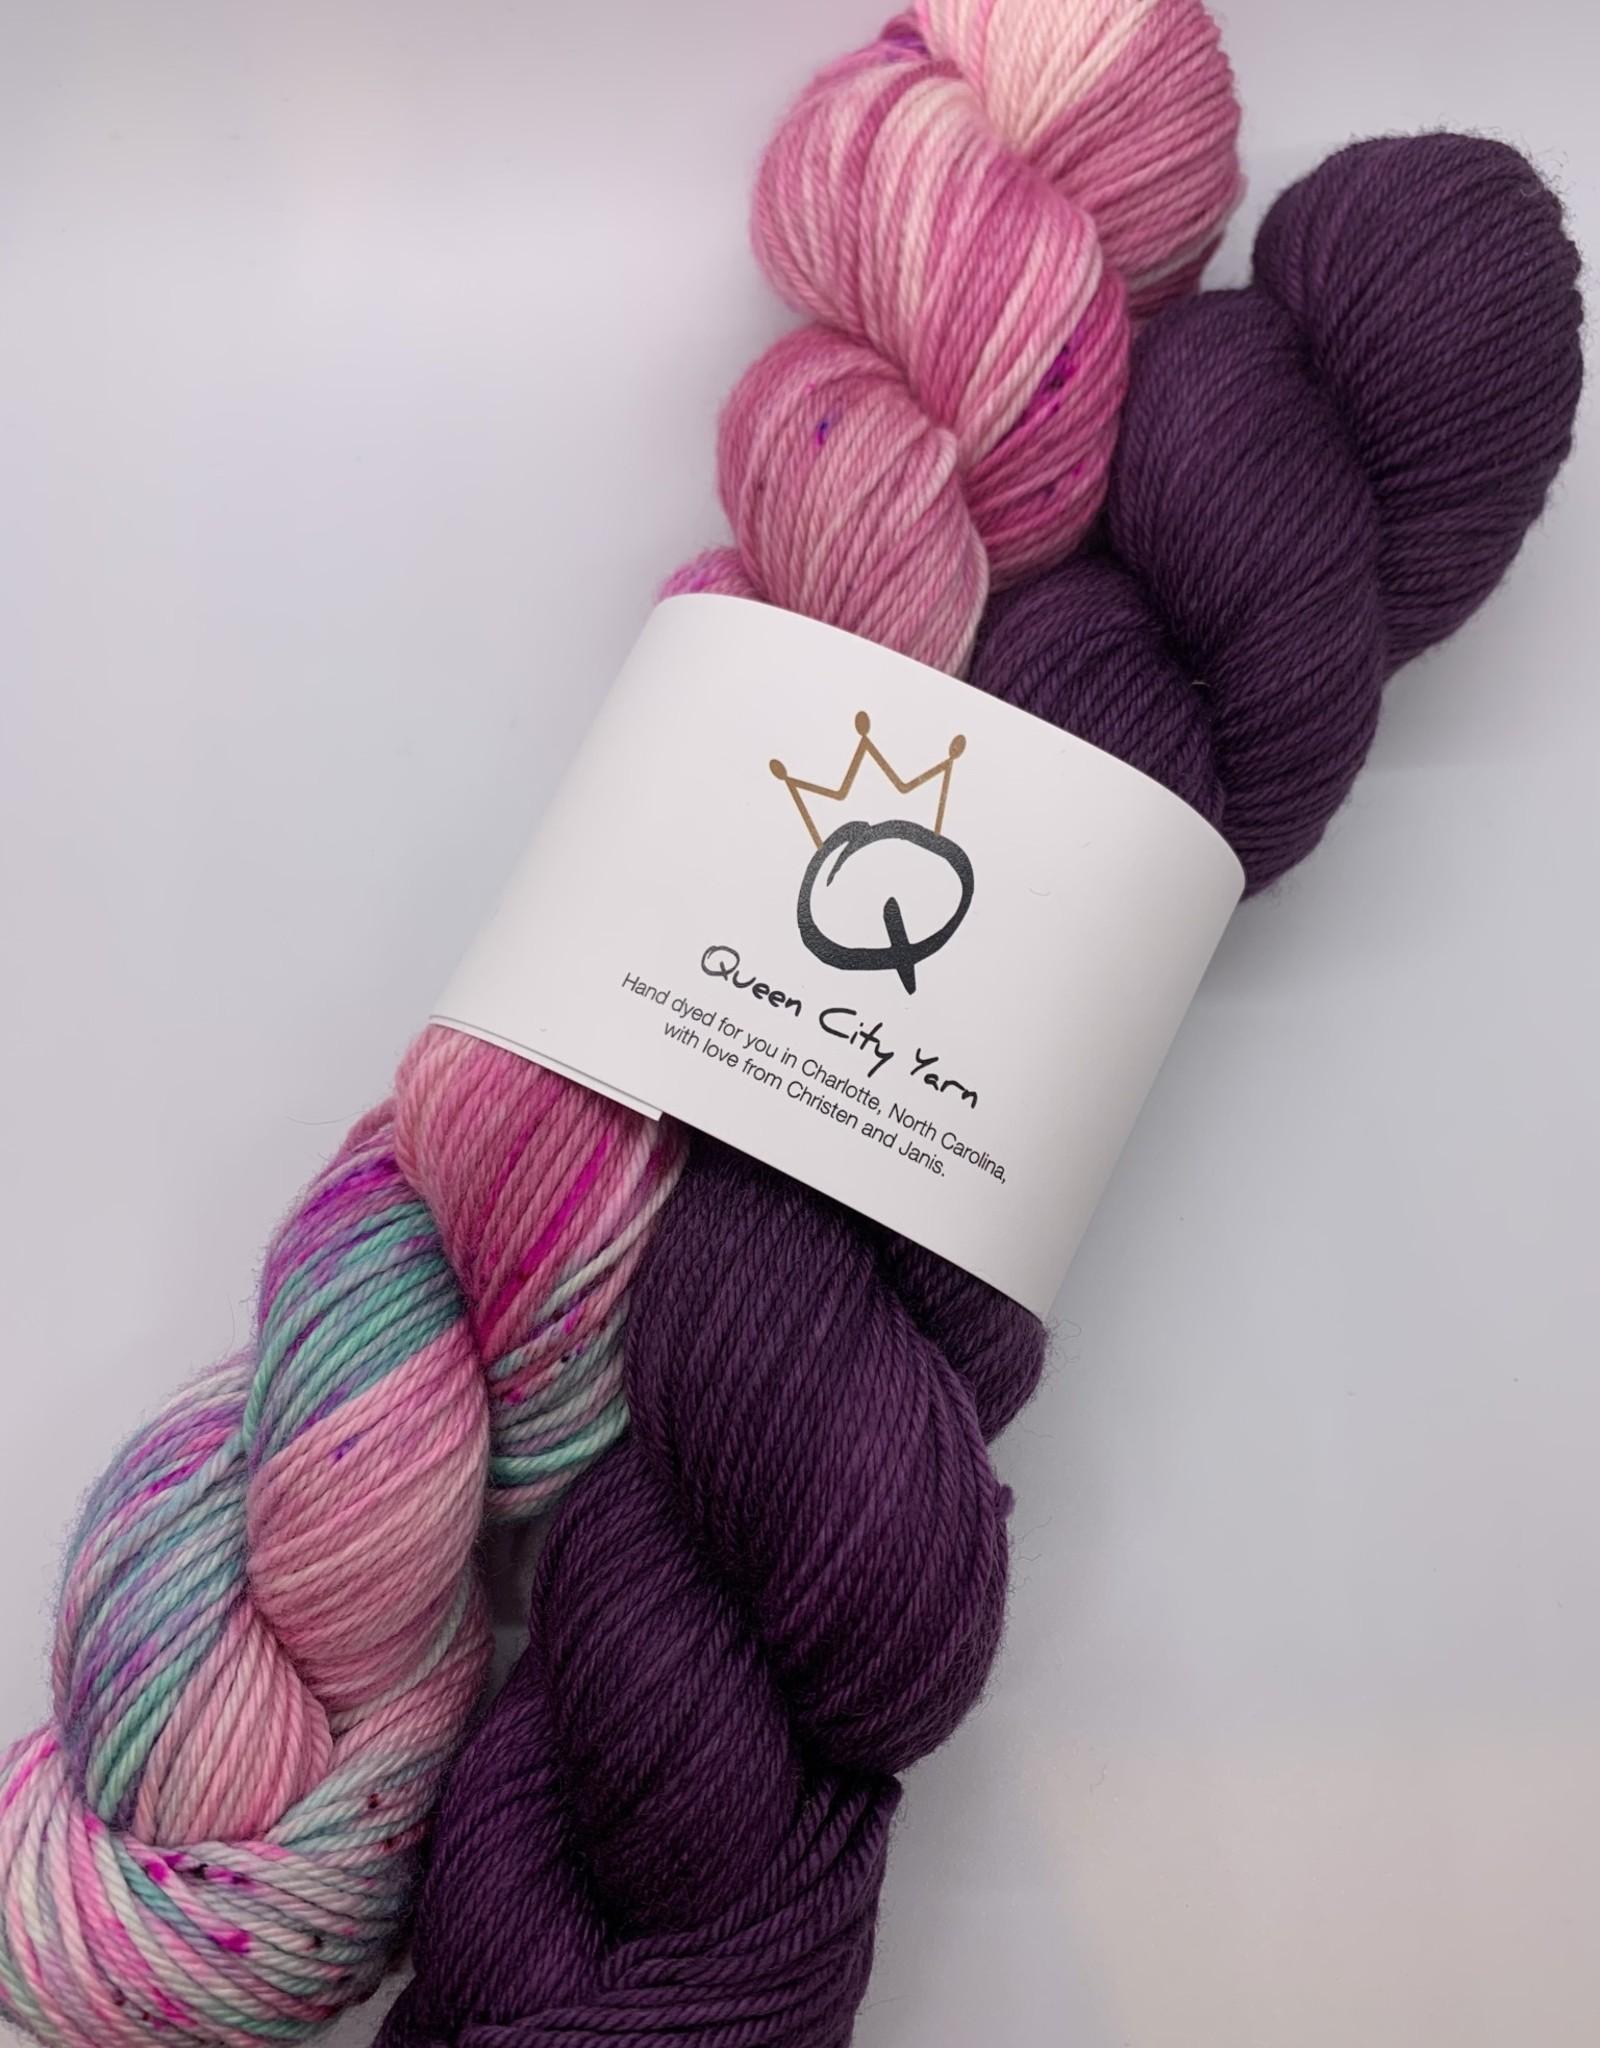 Queen City Yarn 2 Color Biddleville DK Kit